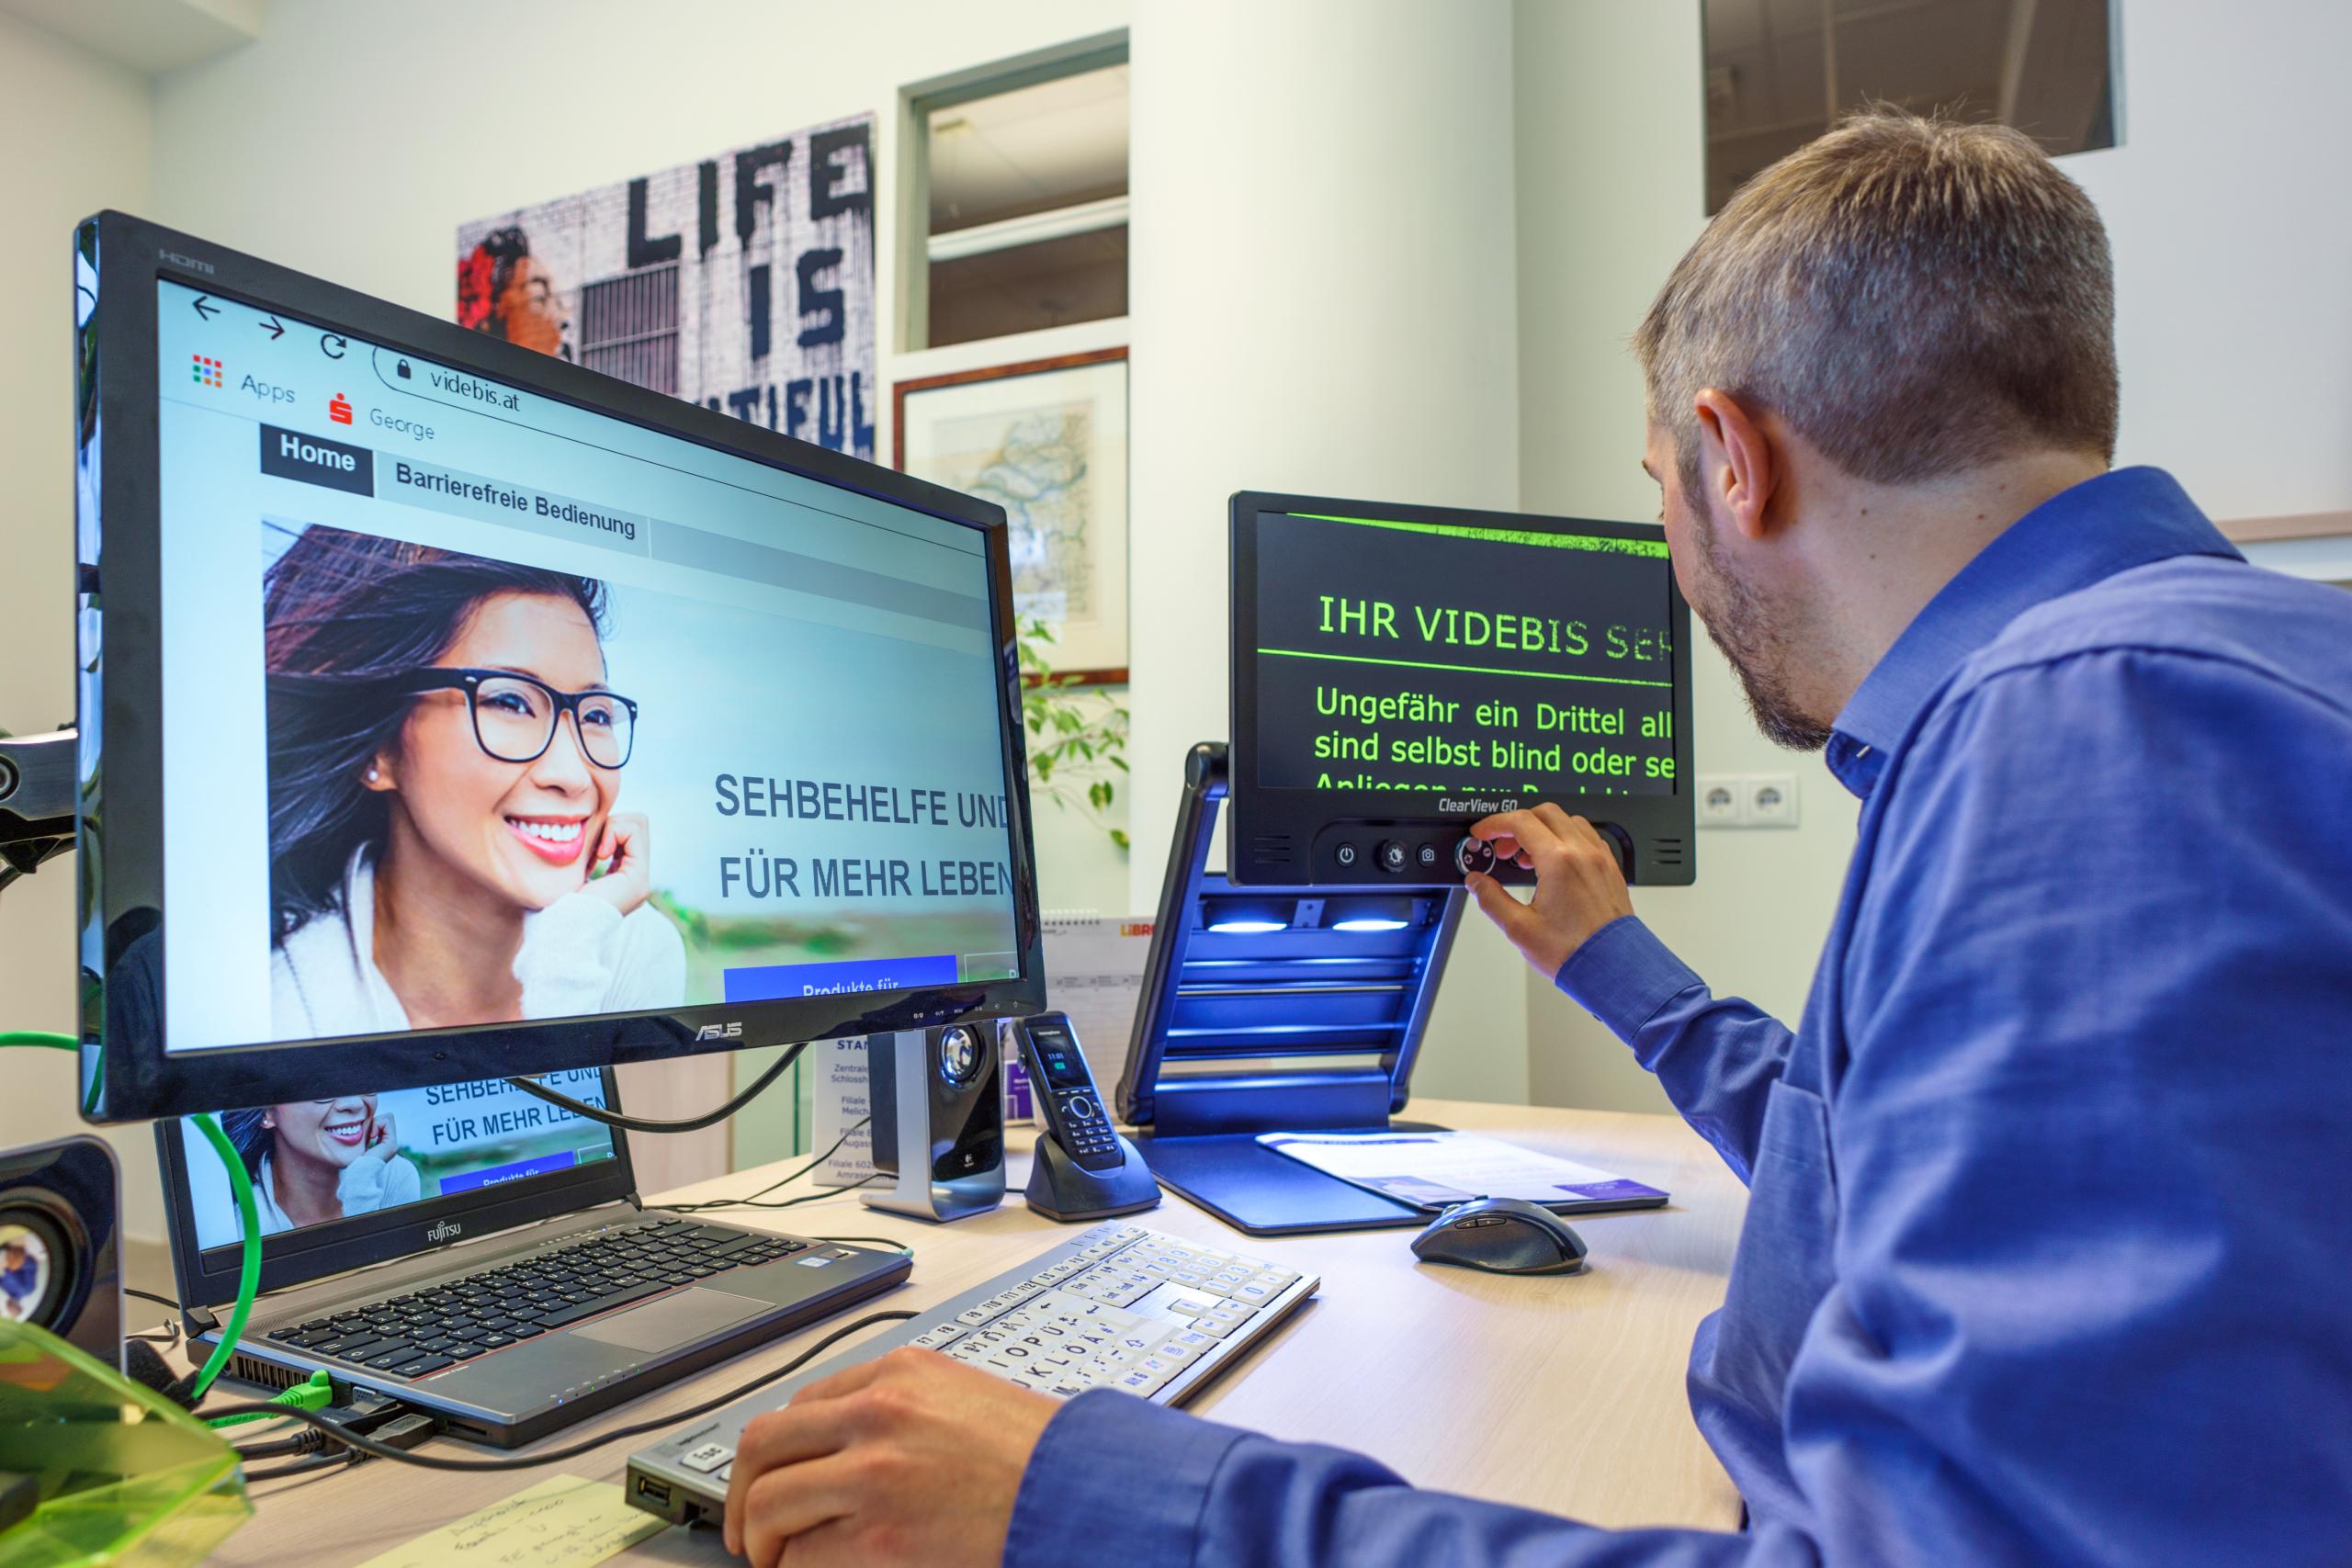 Man sitting at desk using computer and CCTV